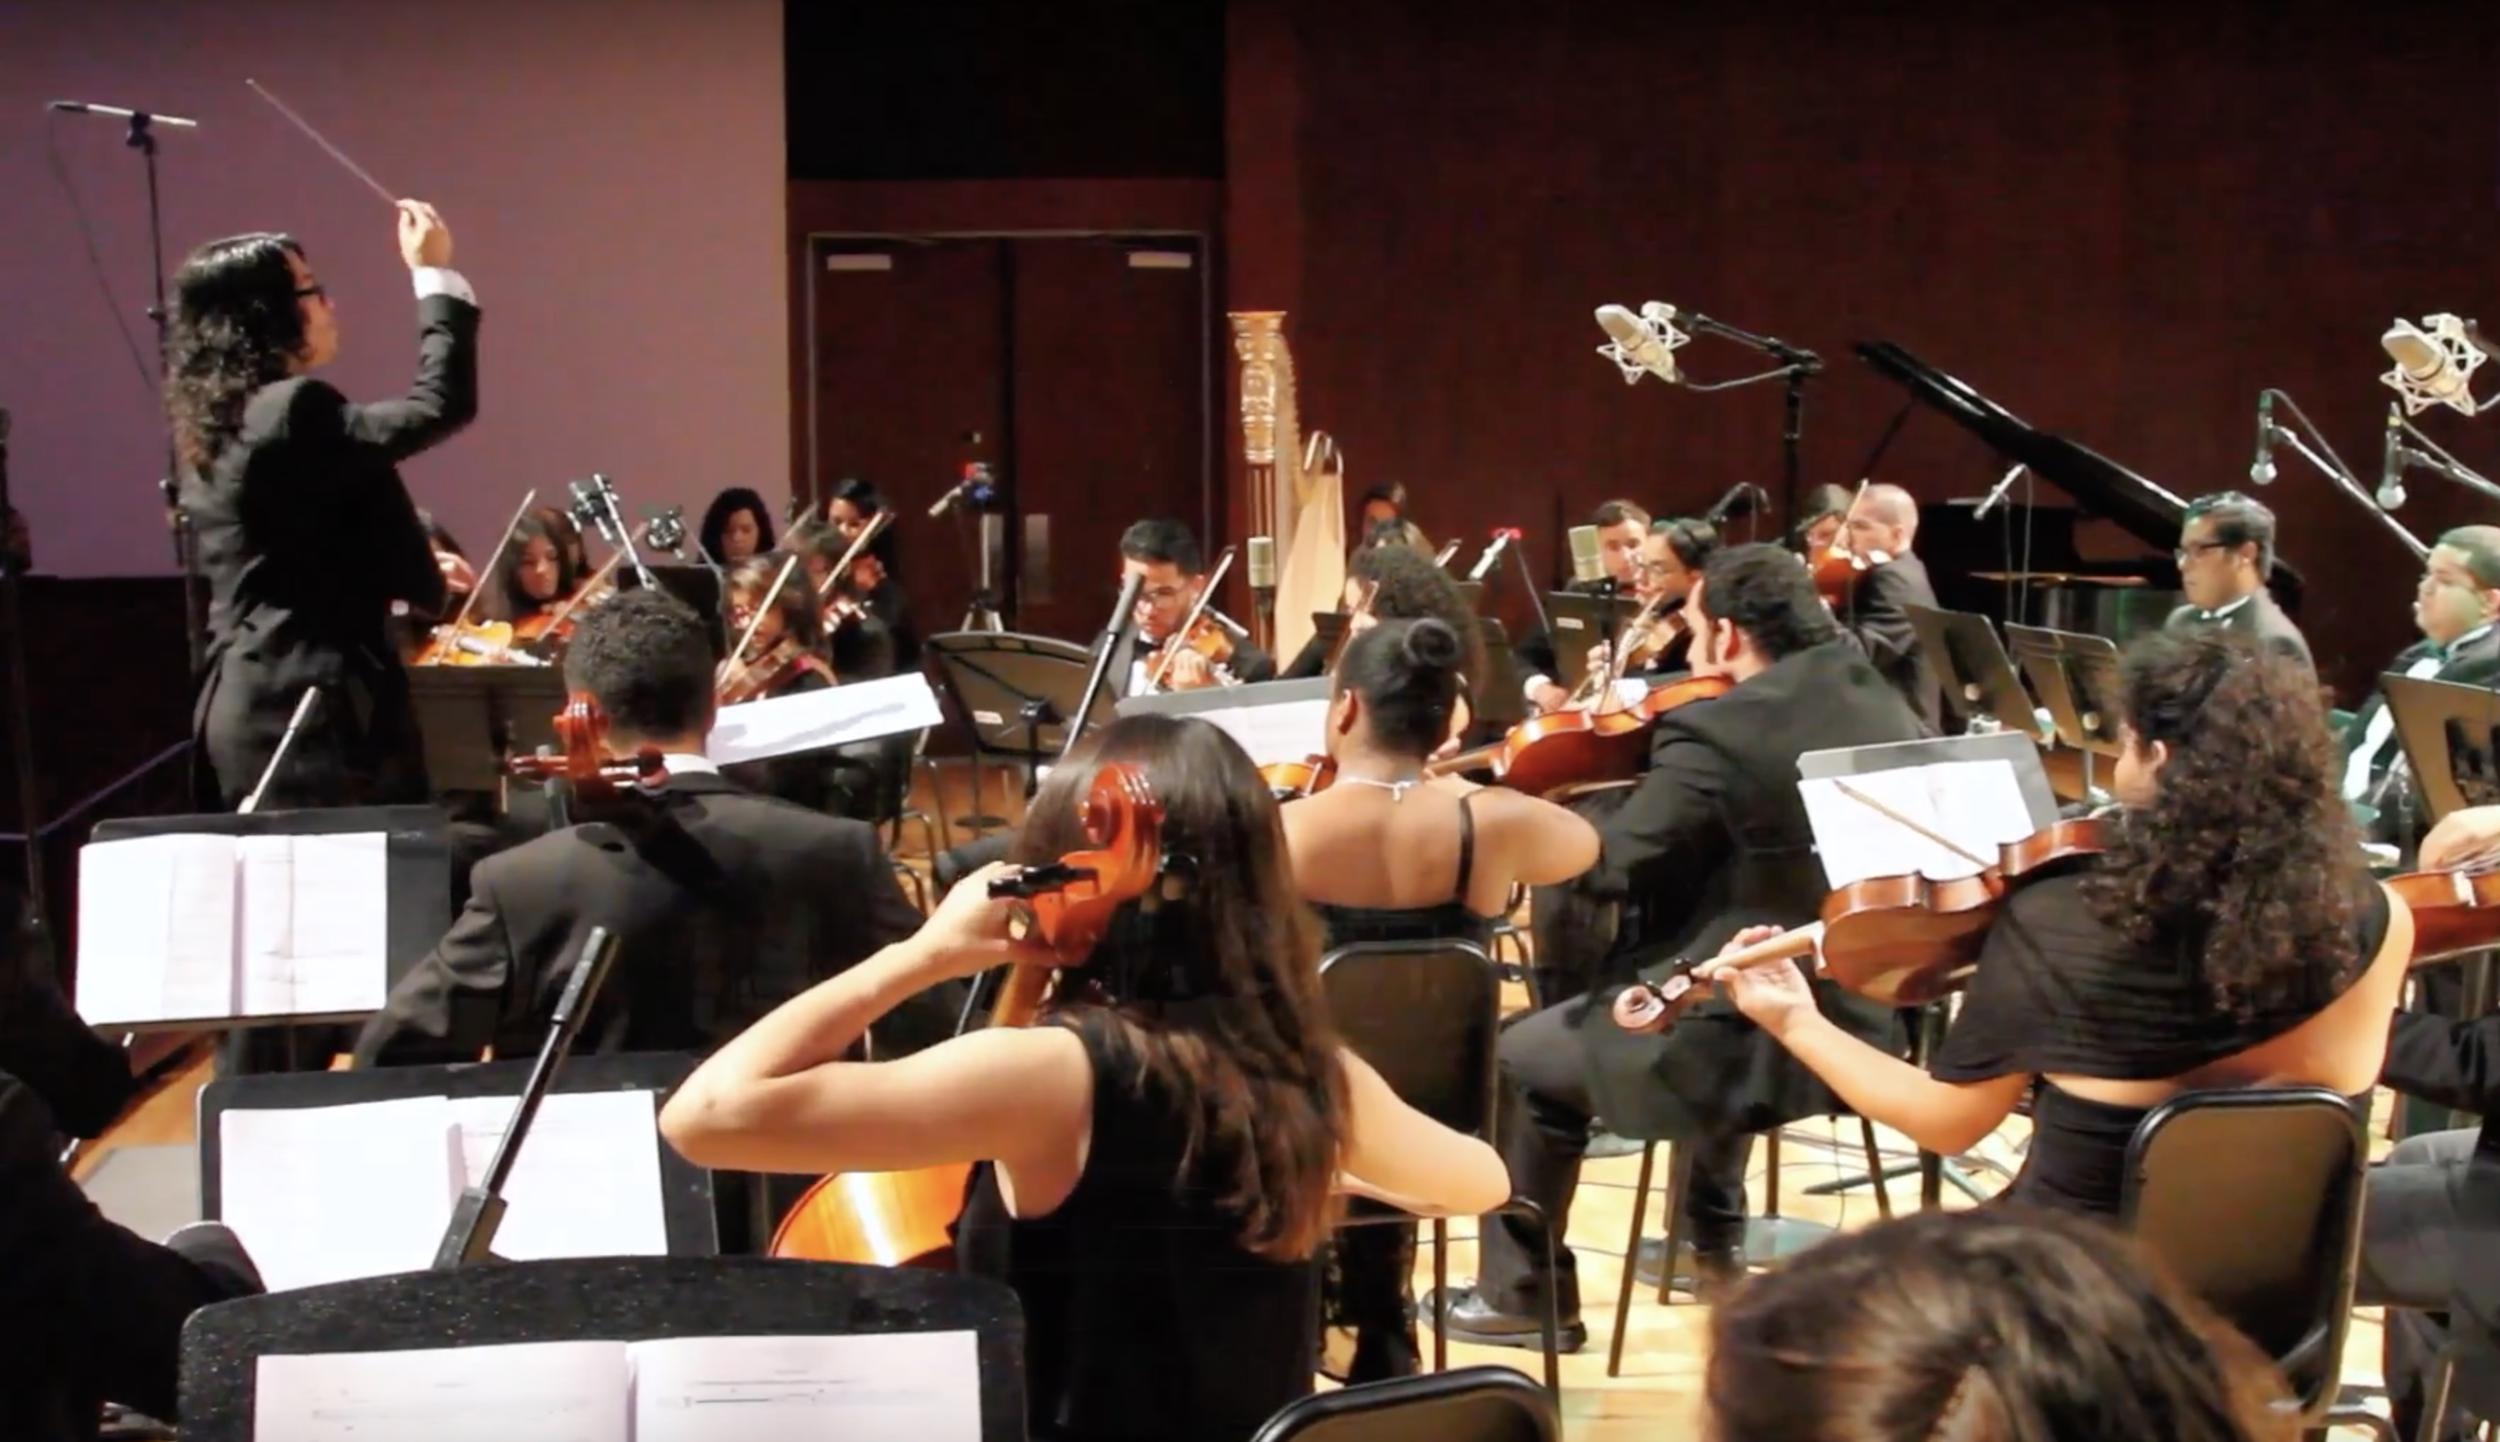 Conducting 2 - by Miradodqui.png